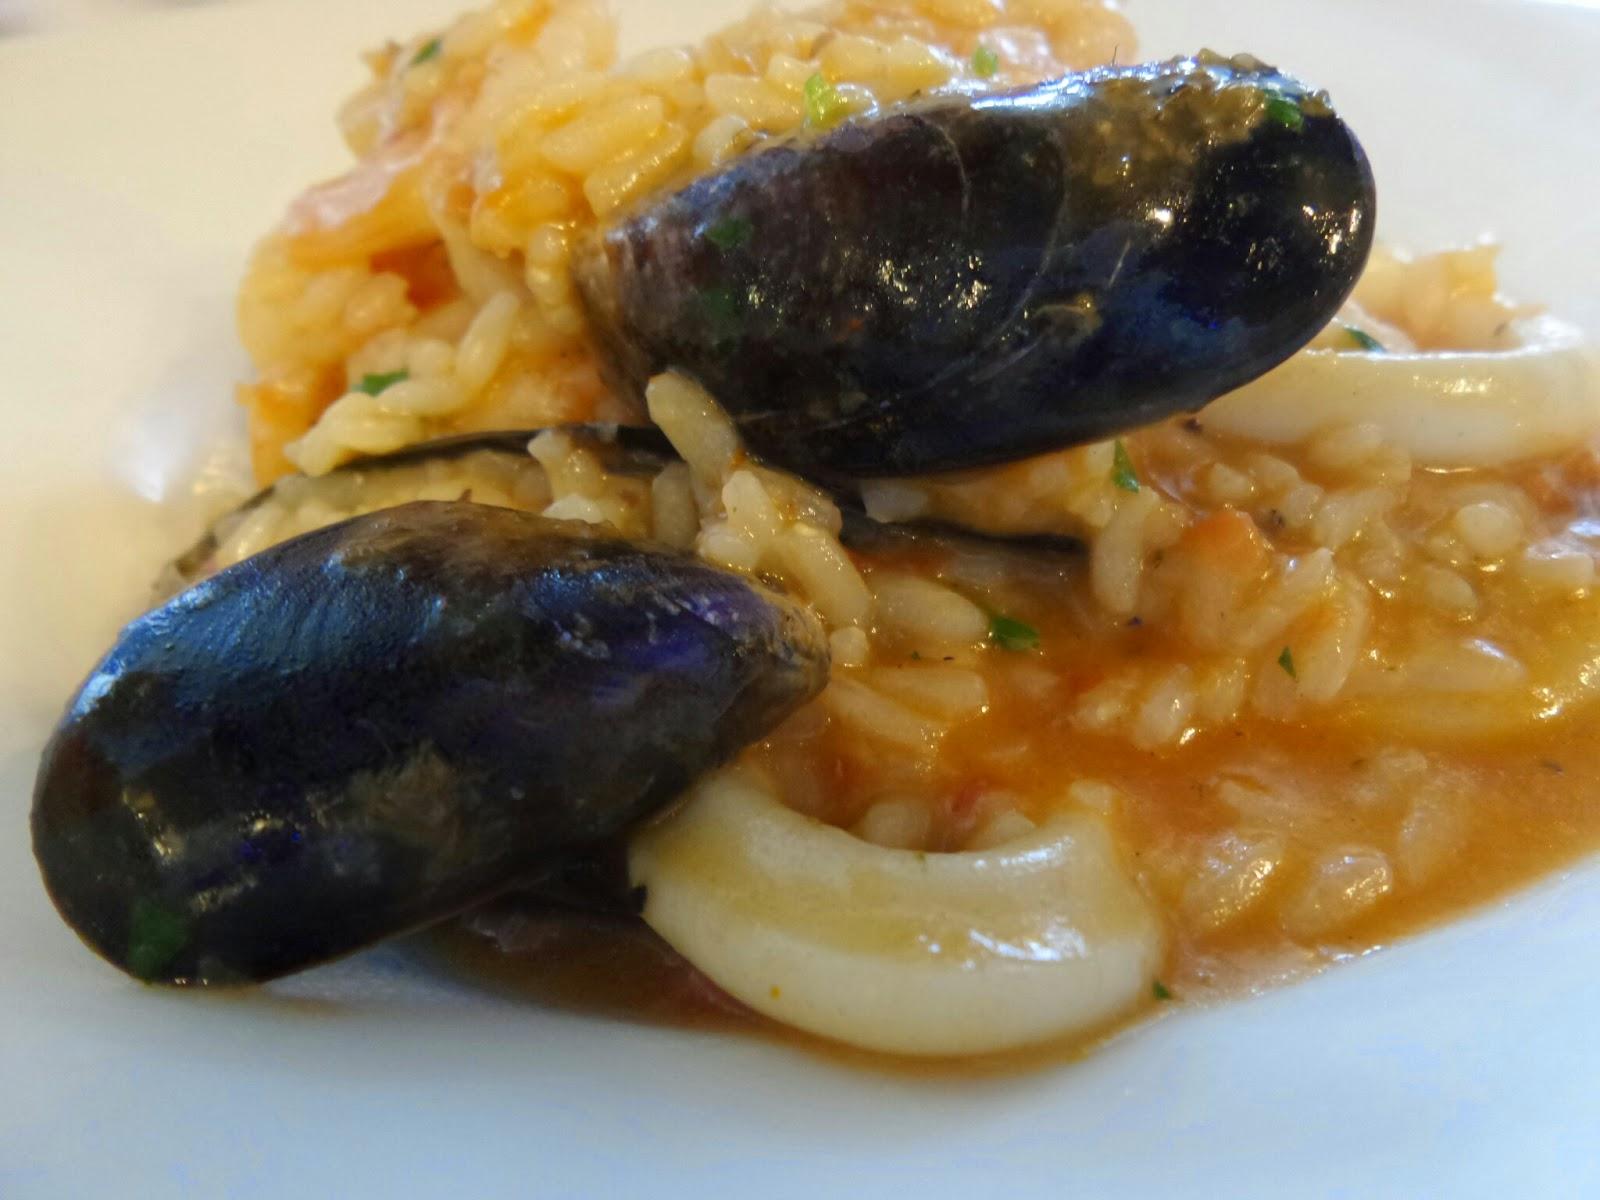 Zizzi's Risotto Pesce